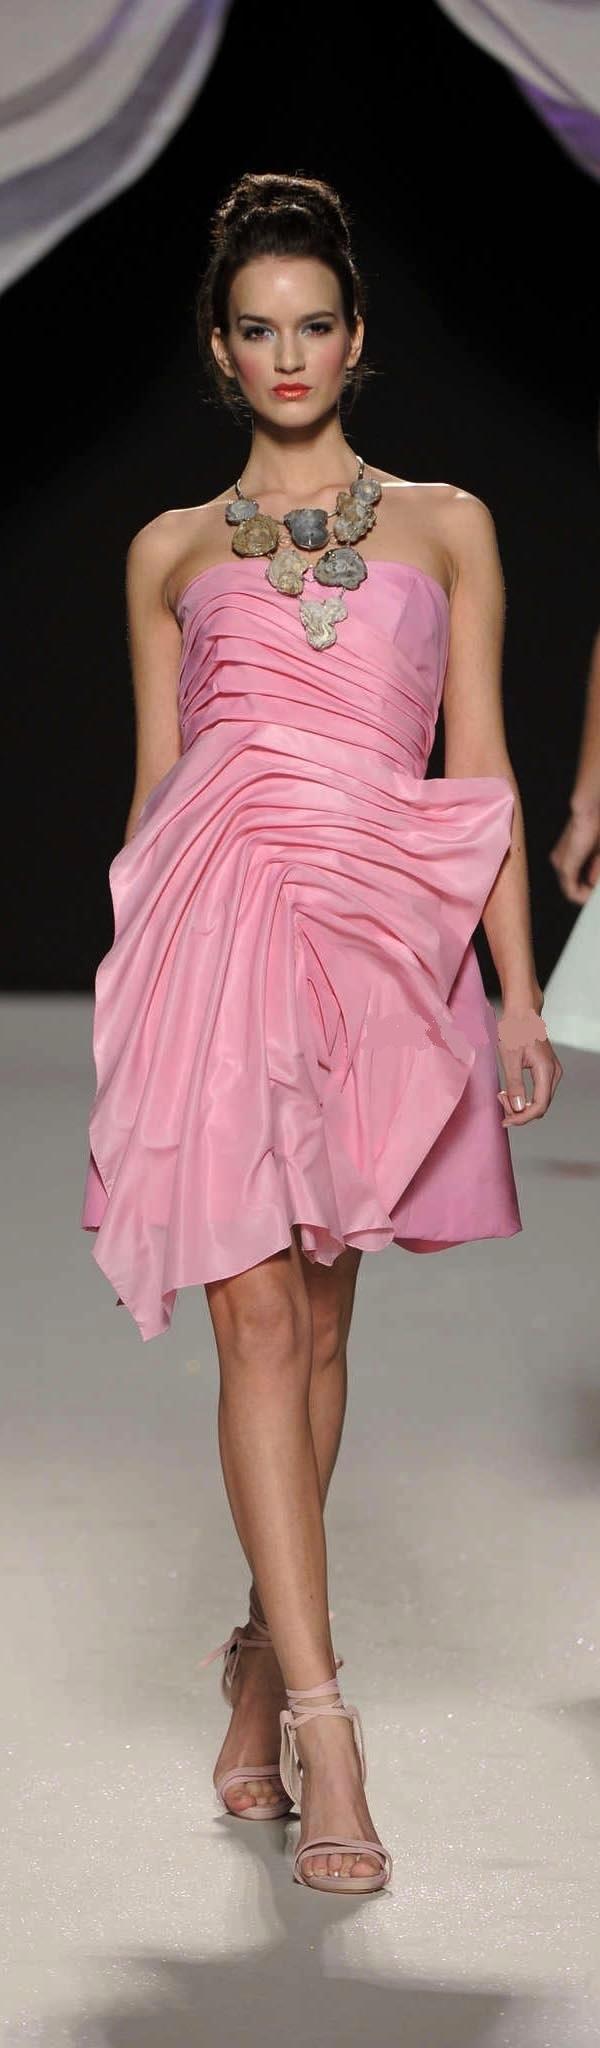 Gattinoni | Jewelry | Pinterest | Rosas, Rosa rosada y Vestidos ...